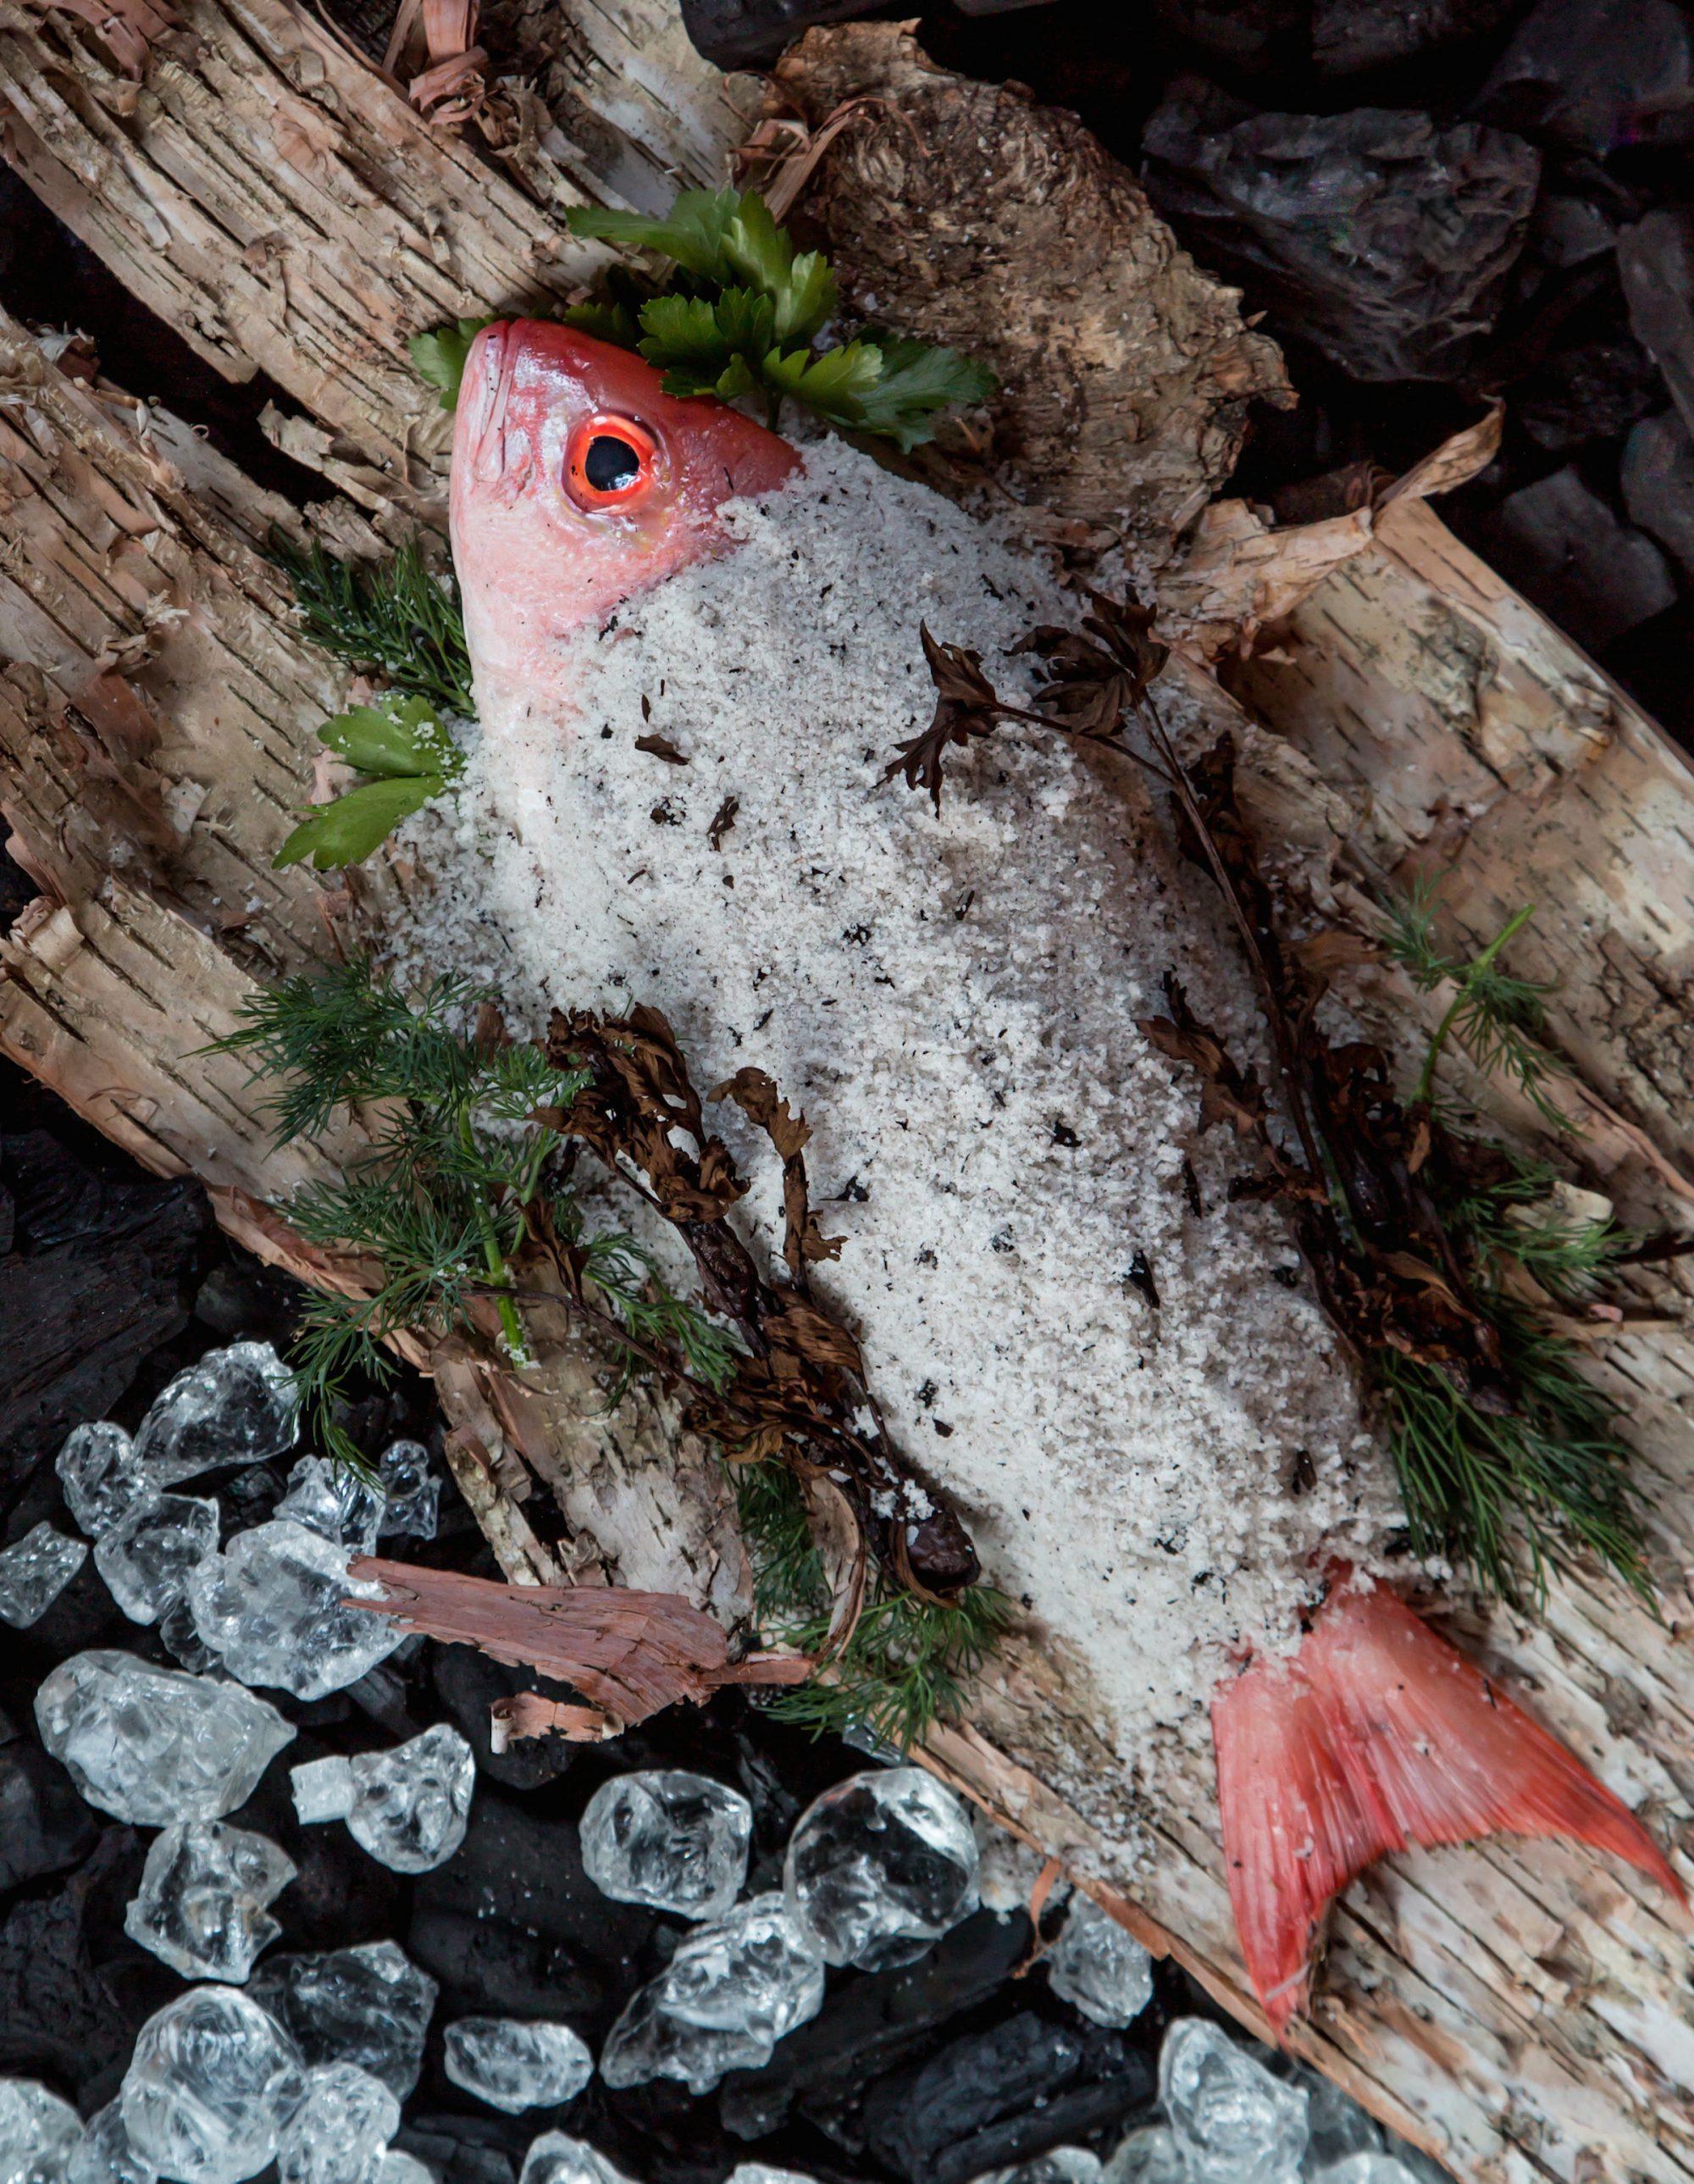 janice-poon-feeding-hannibal-ash-salt-baked-snapper-web